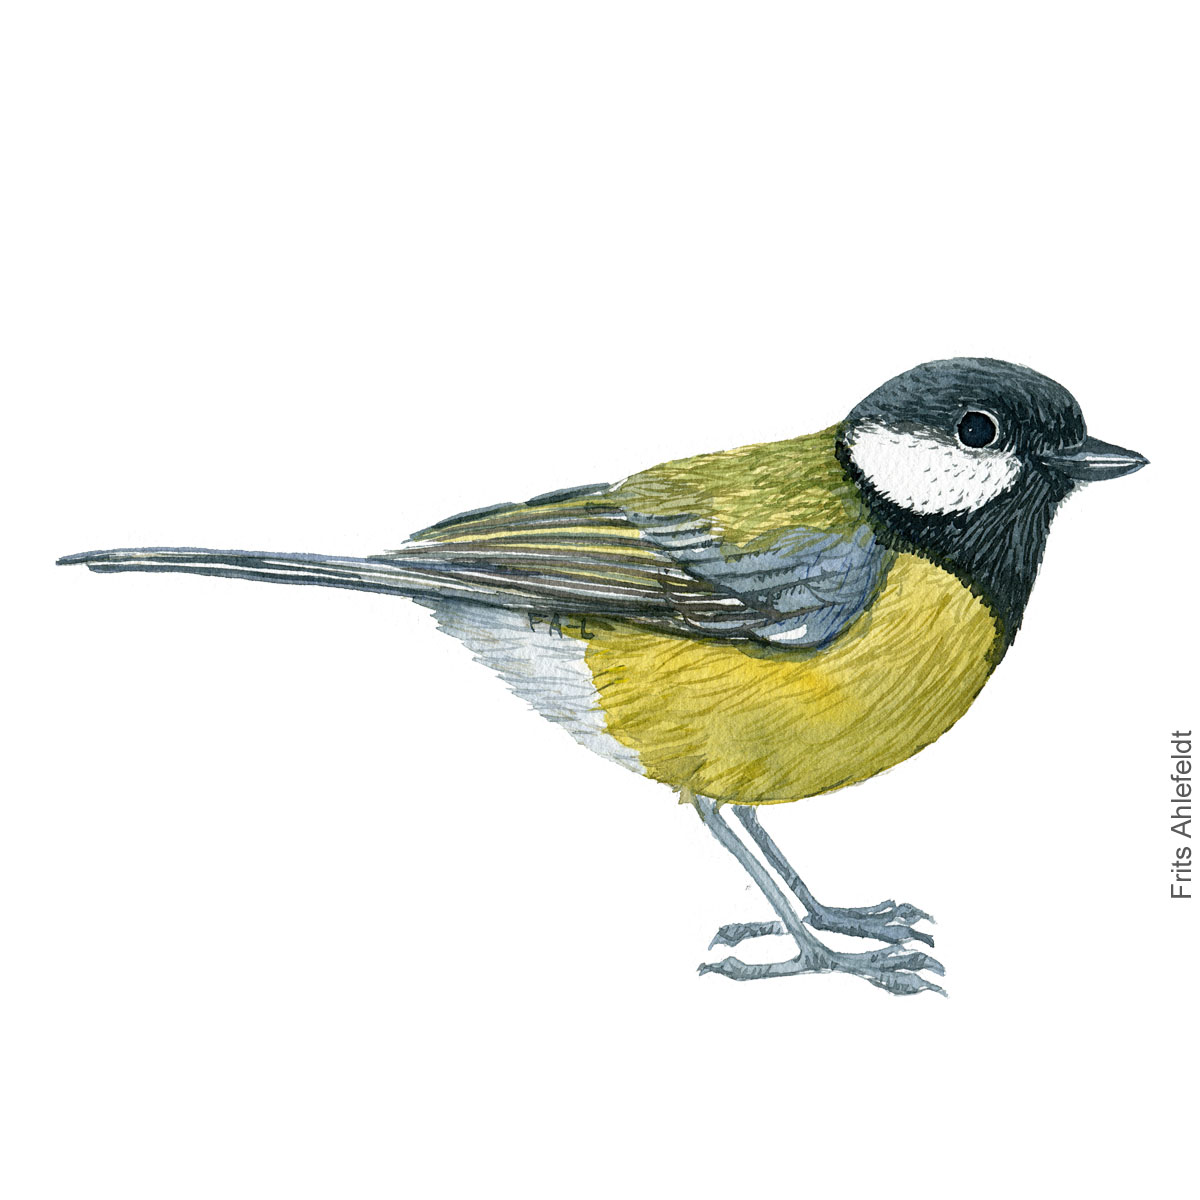 Musvit - Great tit - Bird watercolor painting. Artwork by Frits Ahlefeldt. Fugle akvarel